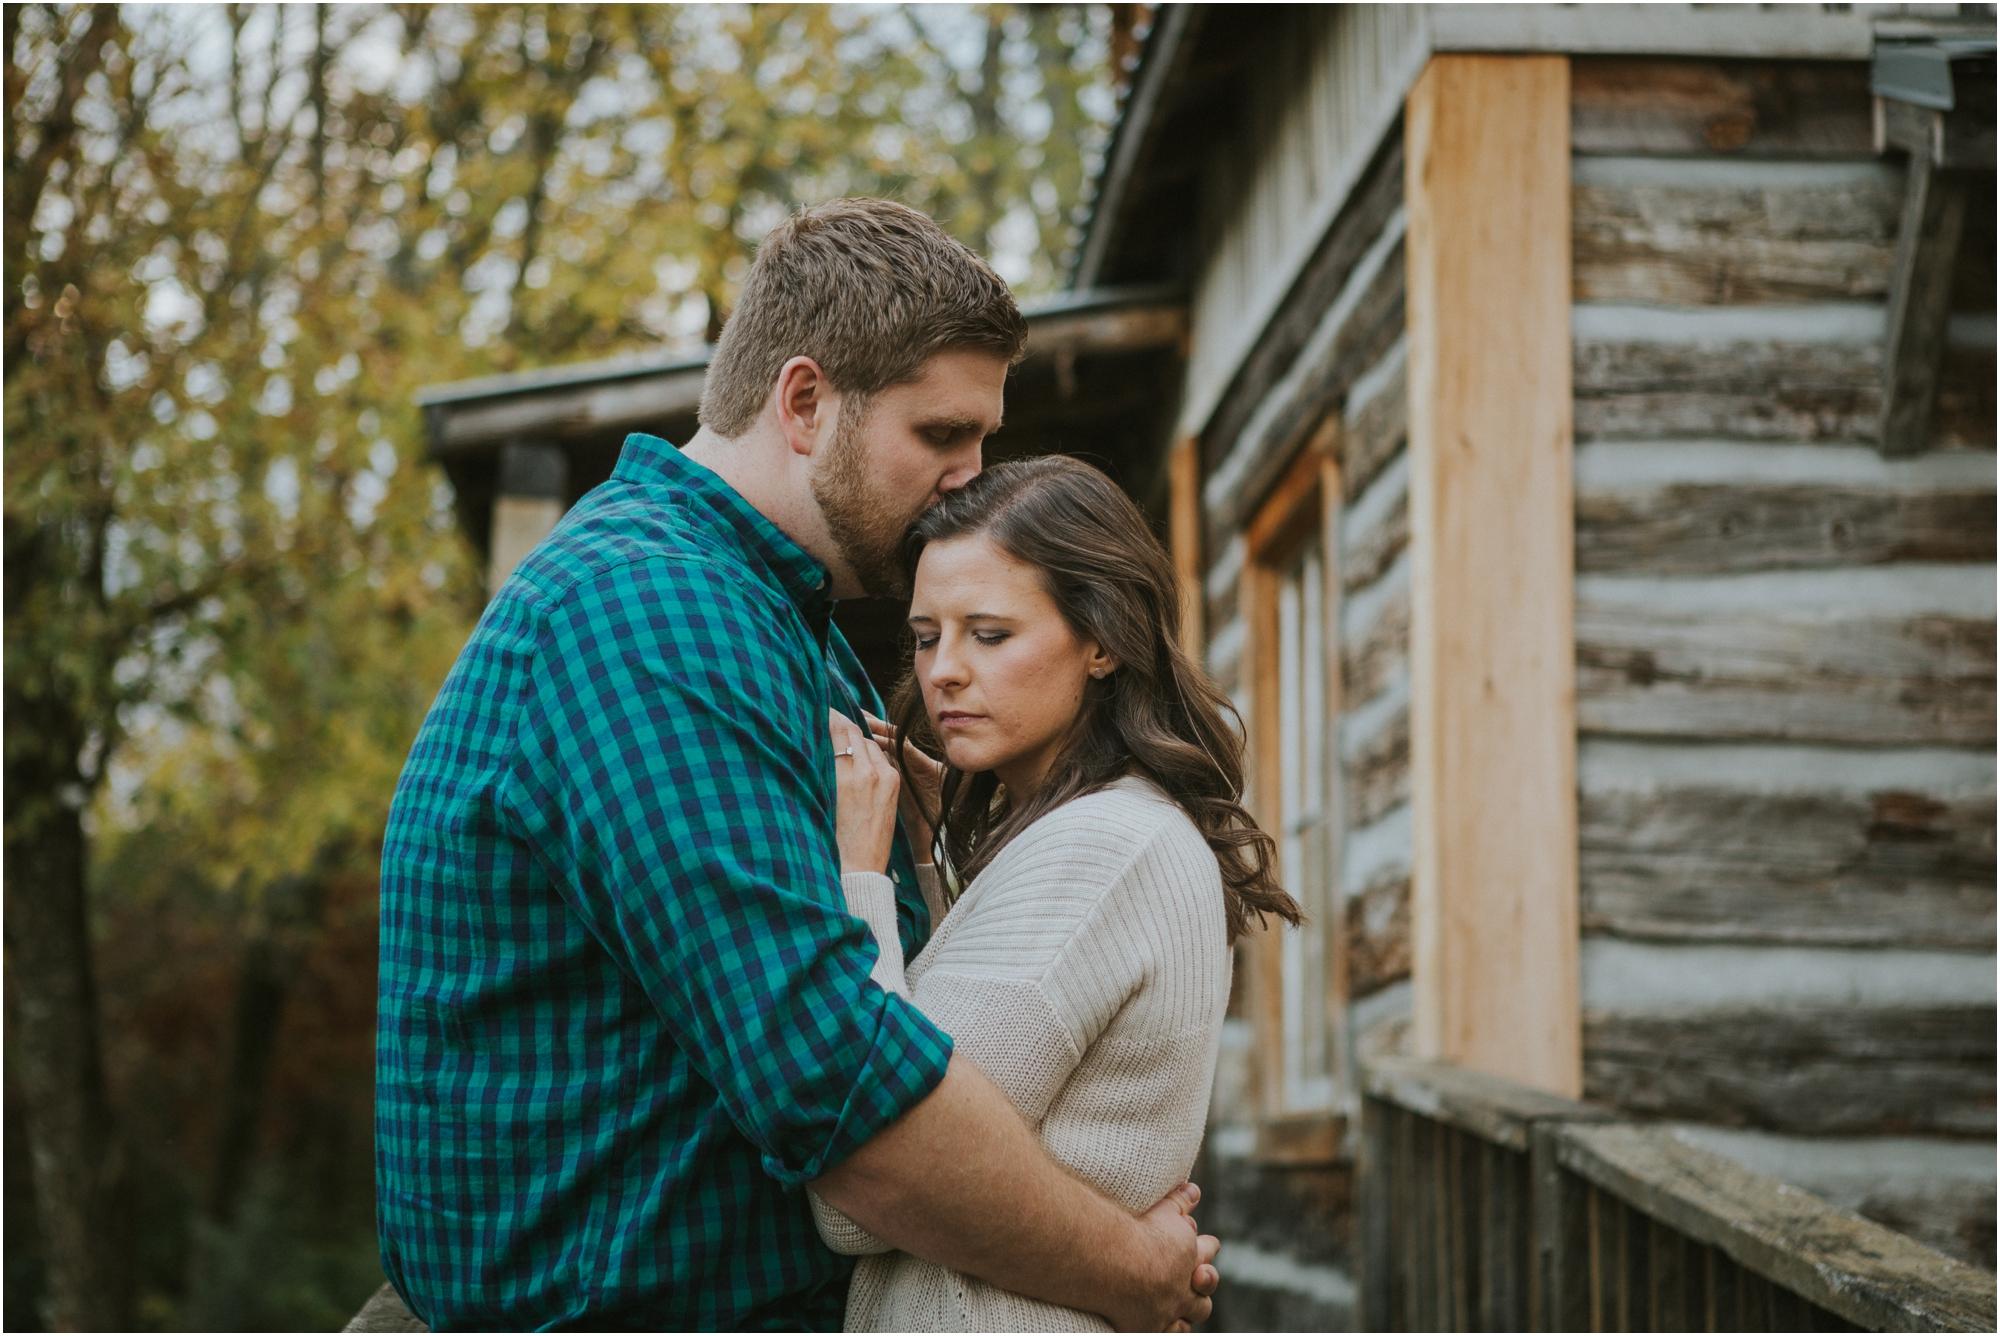 katy-sergent-millstone-limestone-tn-rustic-fall-engagement-session-adventurous-outdoors-intimate-elopement-wedding-northeast-johnson-city-photographer_0026.jpg